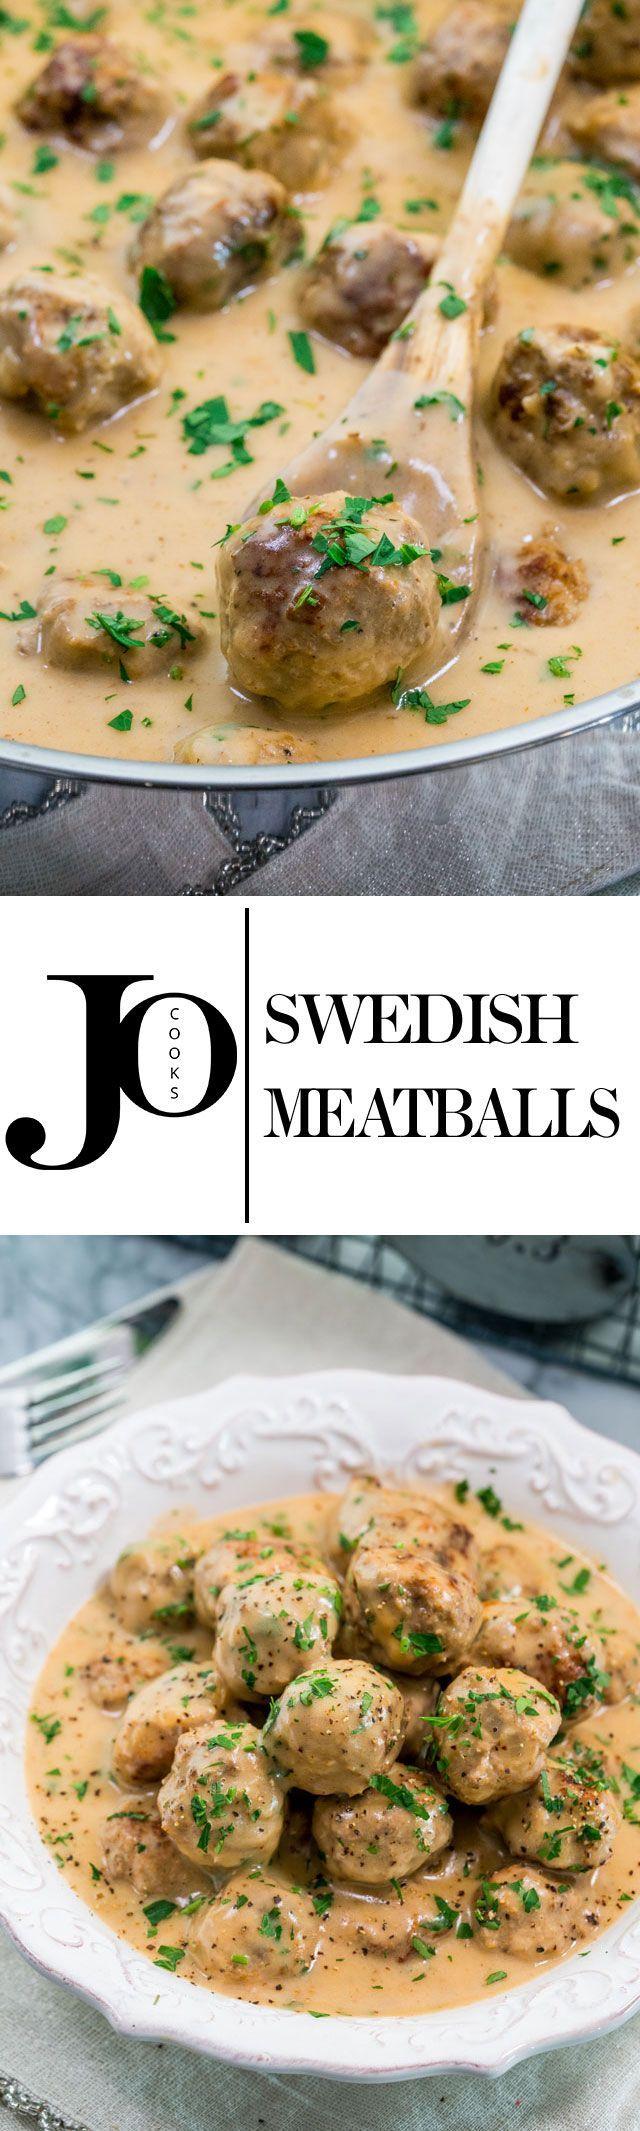 Slow Cooker: Swedish Meatballs - Jo Cooks